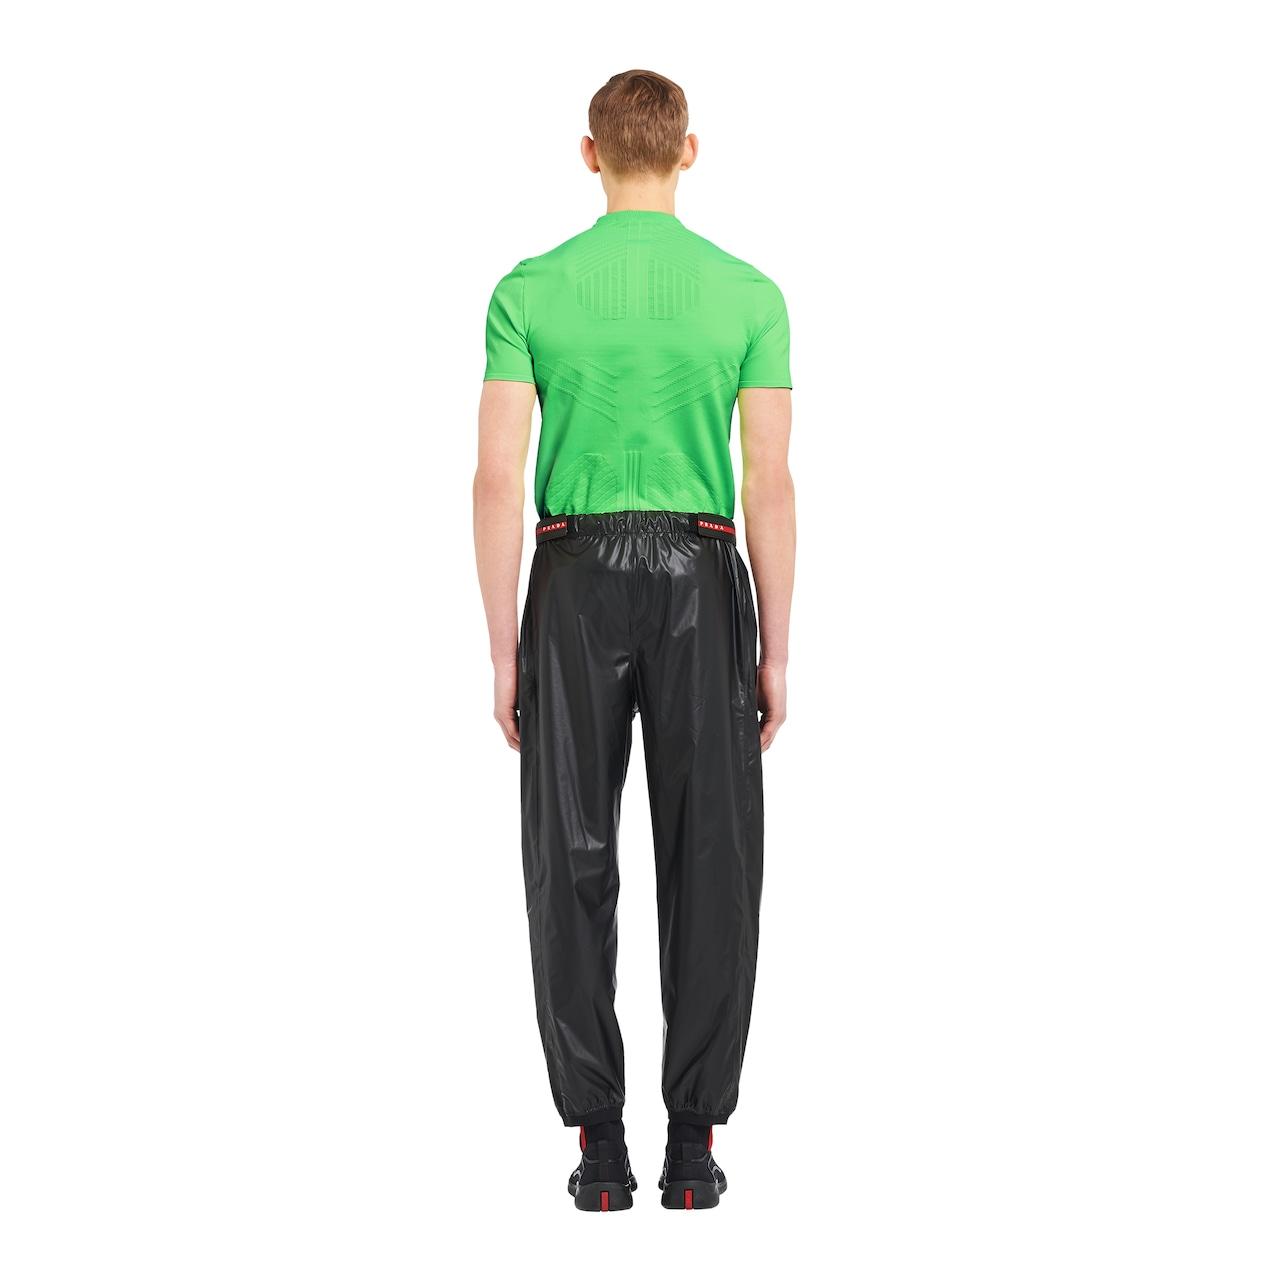 Prada 尼龙长裤 LR-LX007 4